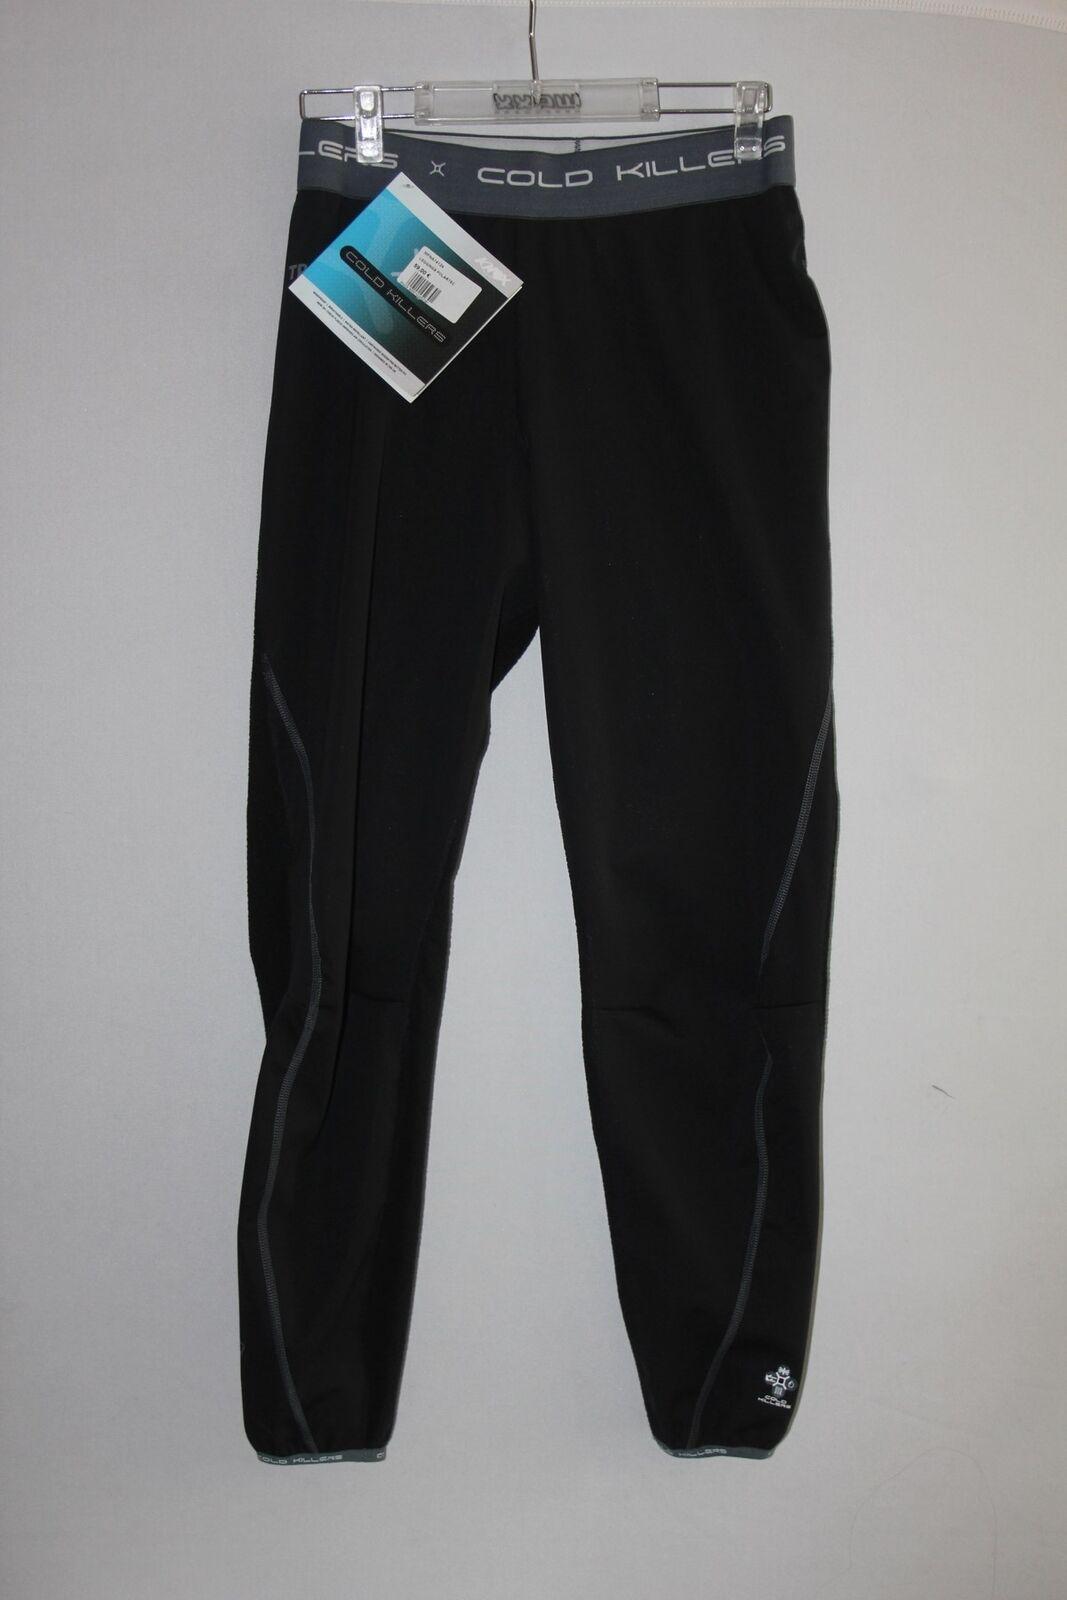 Legging Sport KNOX Cold Killer Base Layer Anti froid black T    XL  - MFNA14124